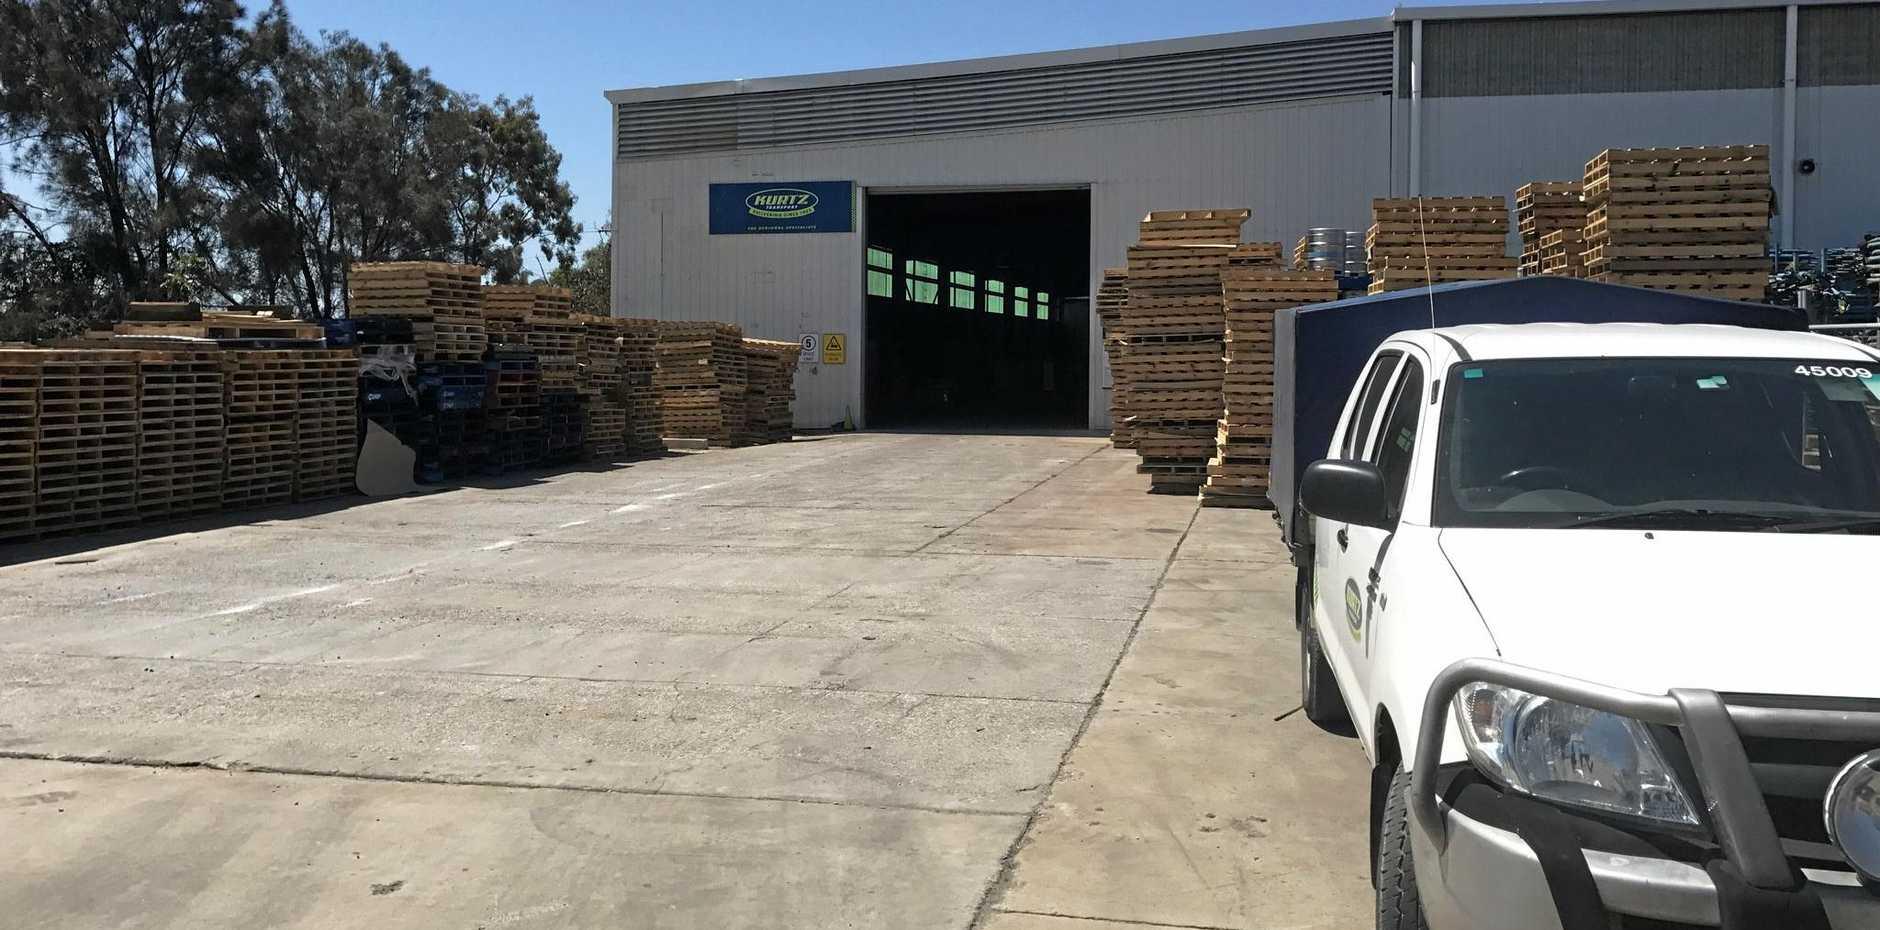 Workers at Kurtz Transport Gladstone depot are still doing their job.